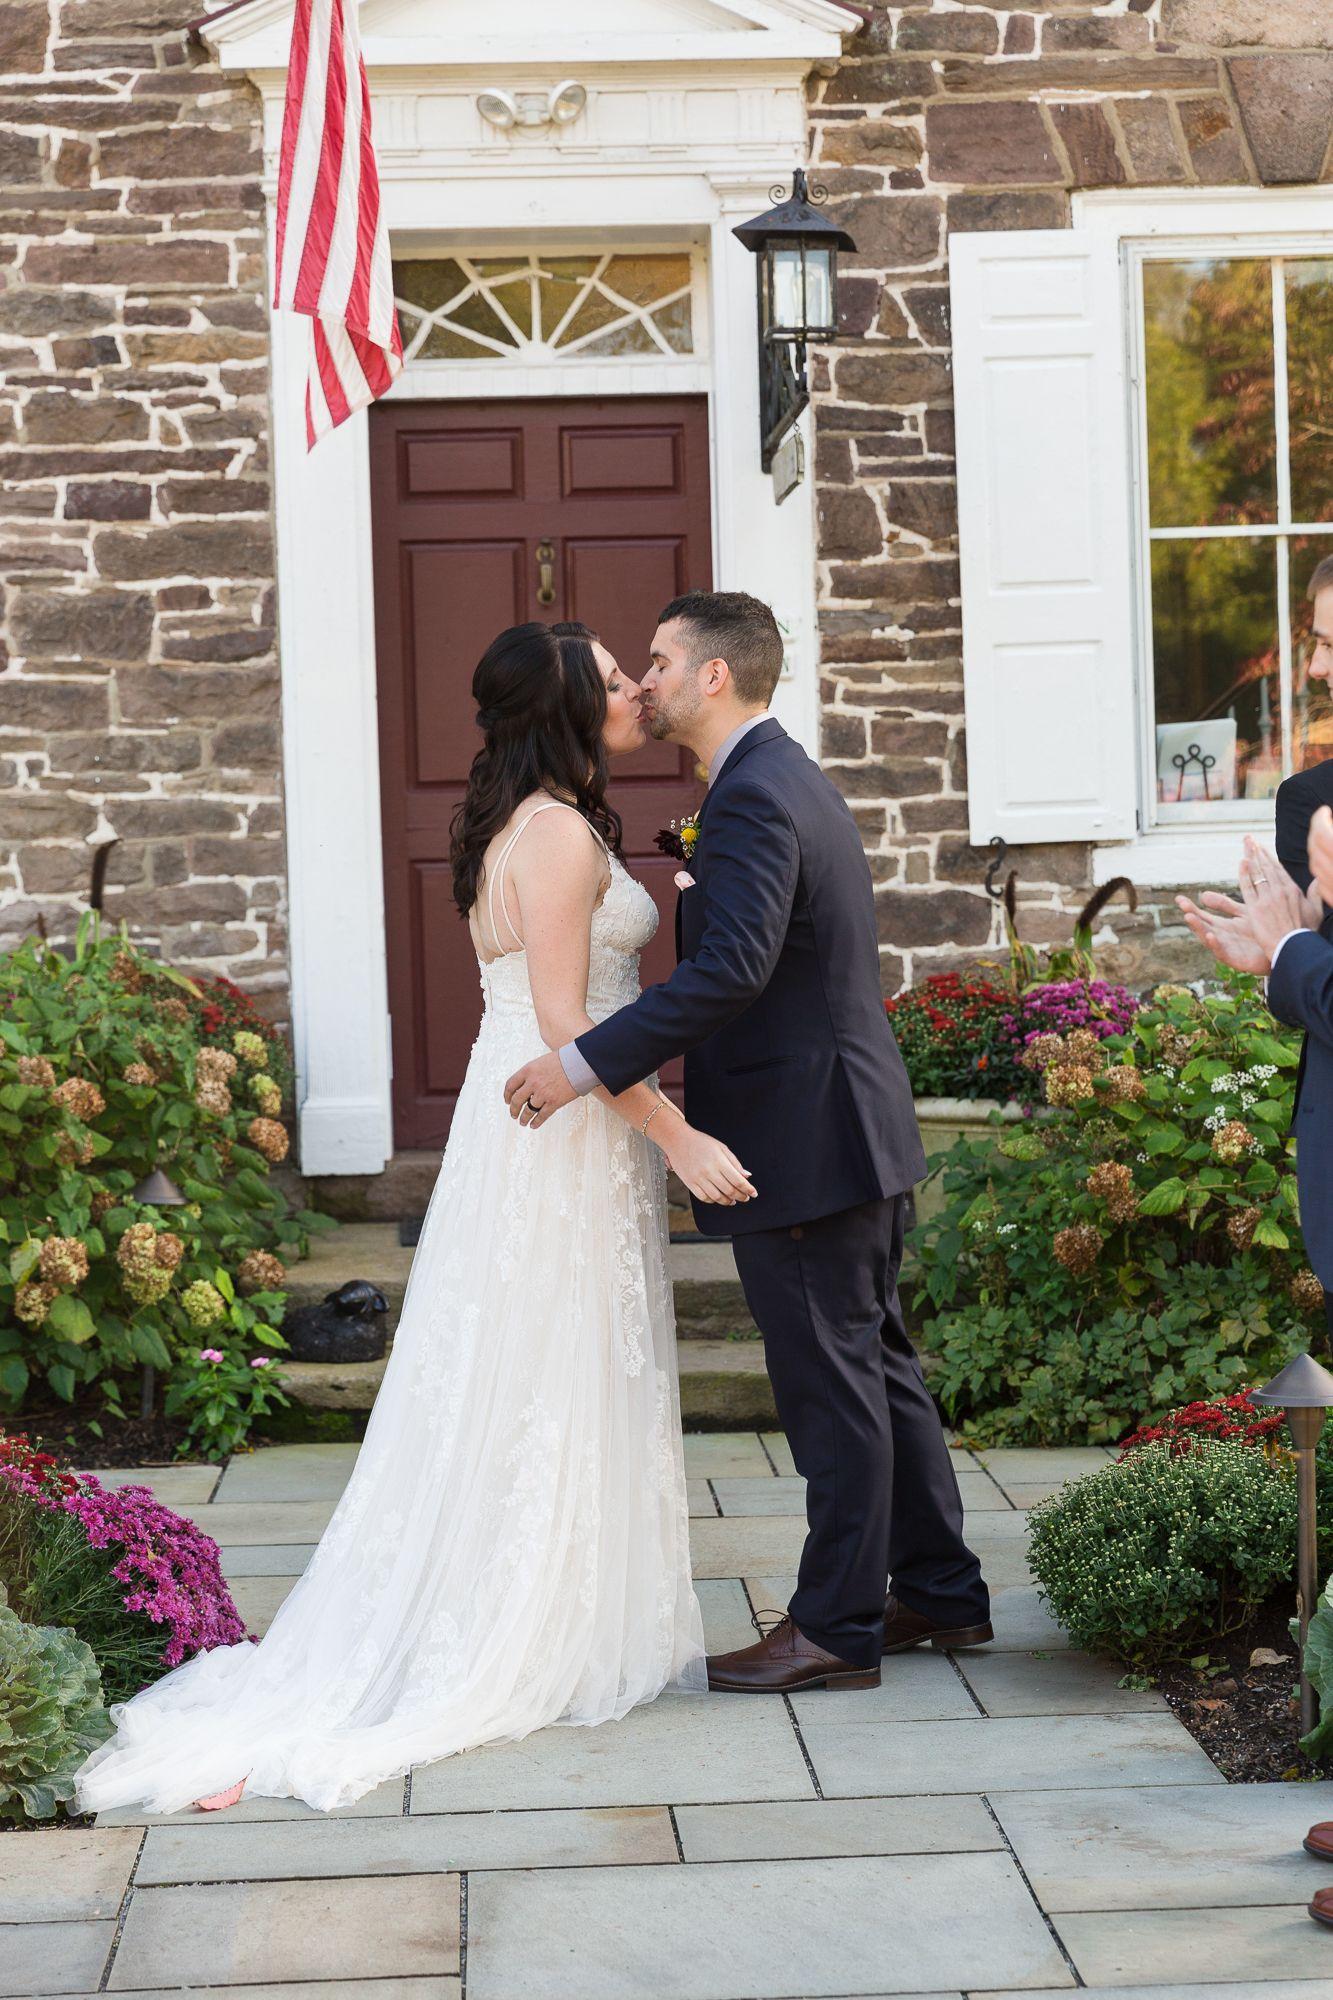 Fall Wedding Ceremony At Woolverton Inn In 2020 Fall Wedding Ceremony Wedding Bride Groom